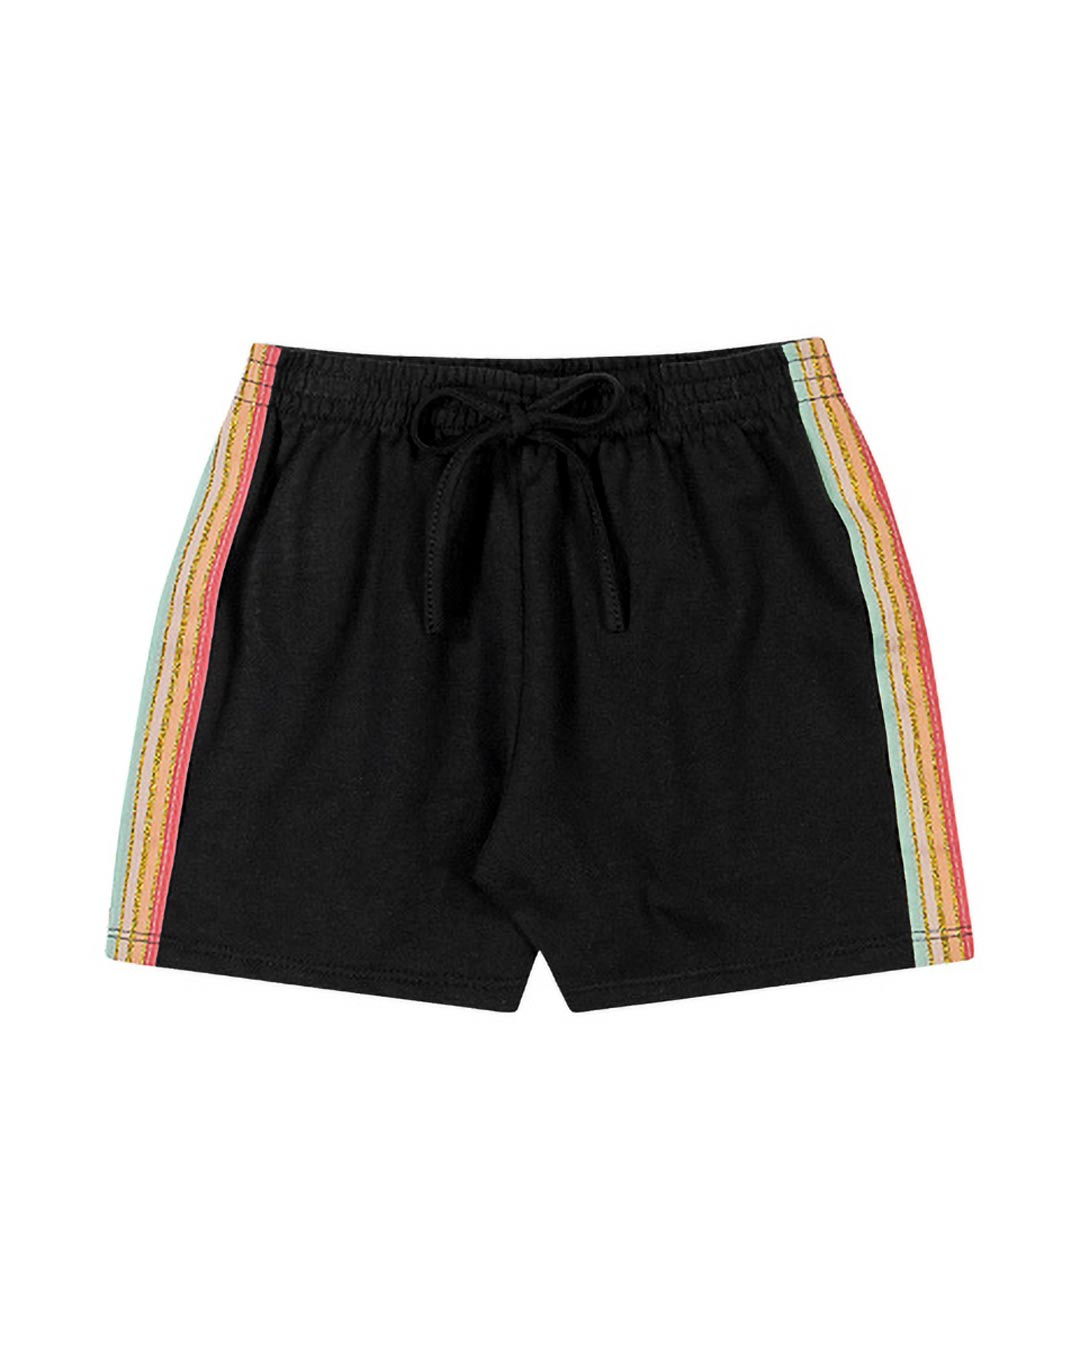 Shorts Infantil Com Glitter - Kely & Kety